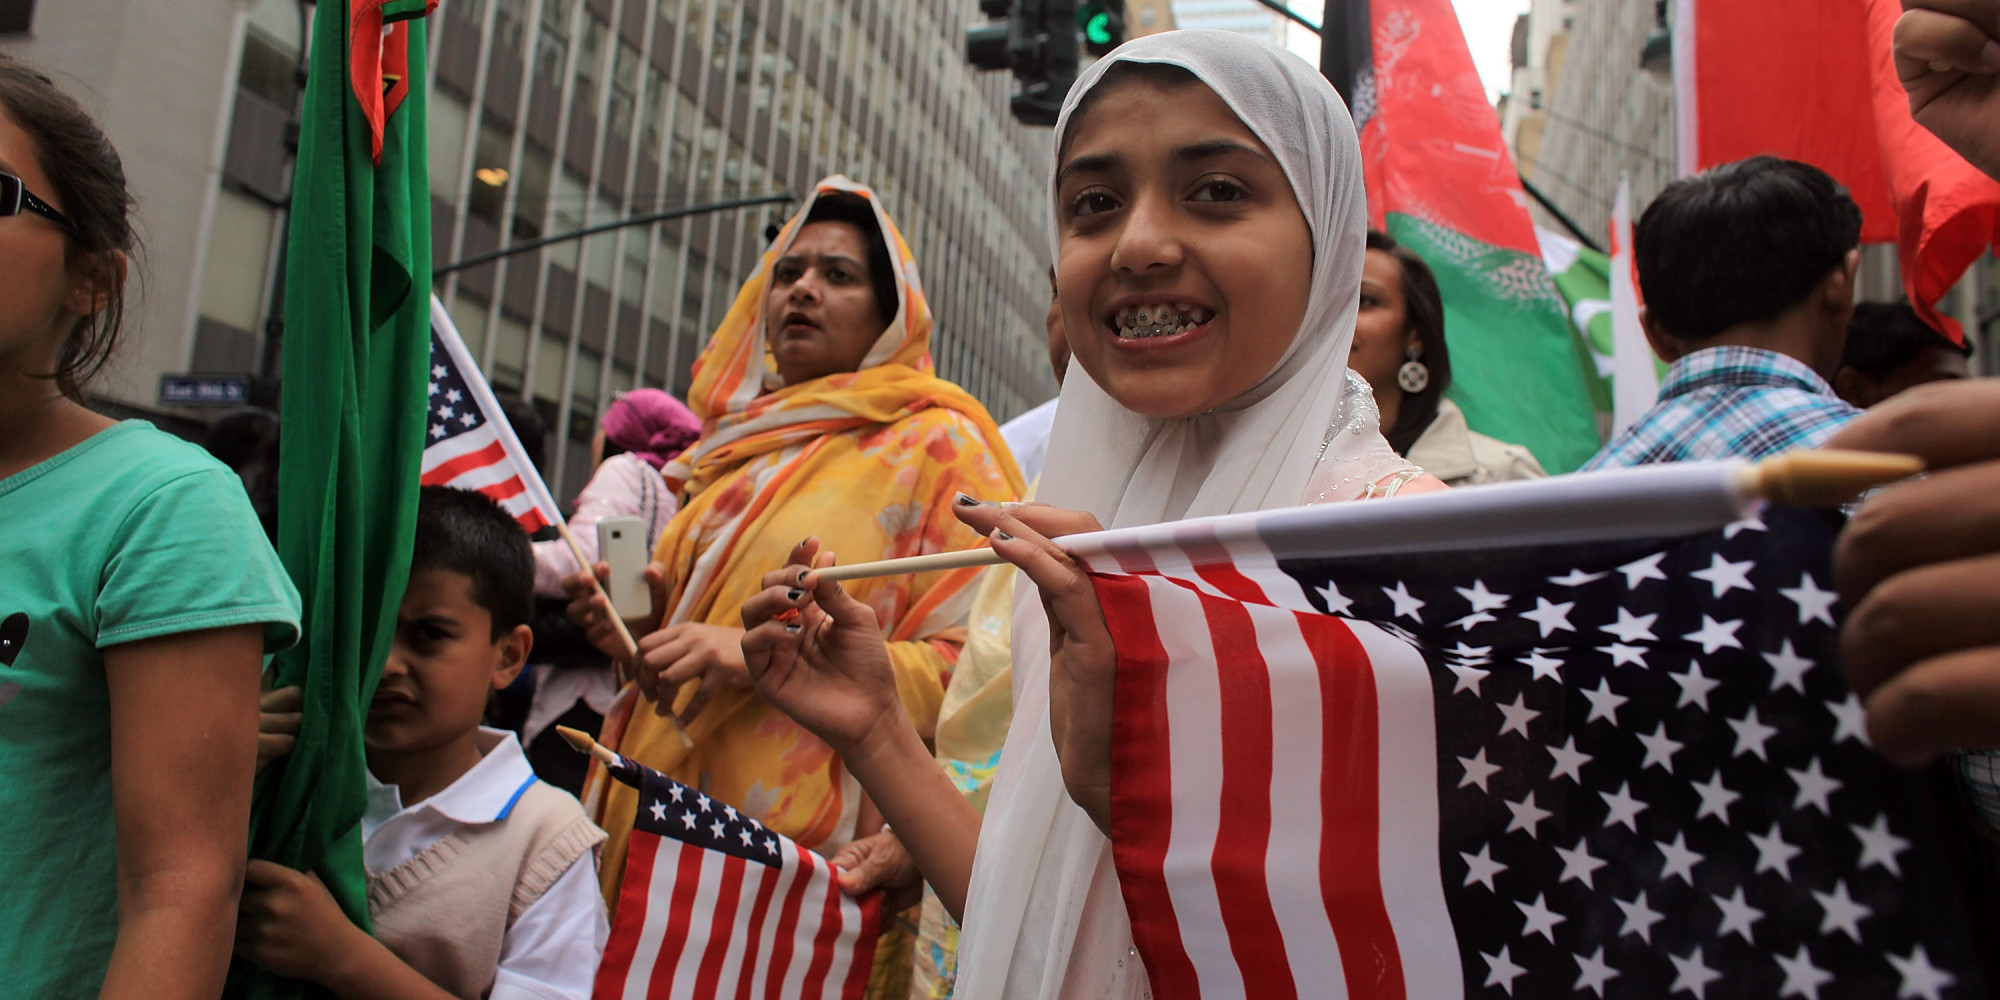 https://i2.wp.com/i.huffpost.com/gen/1700590/images/o-AMERICAN-MUSLIMS-PARADE-facebook.jpg